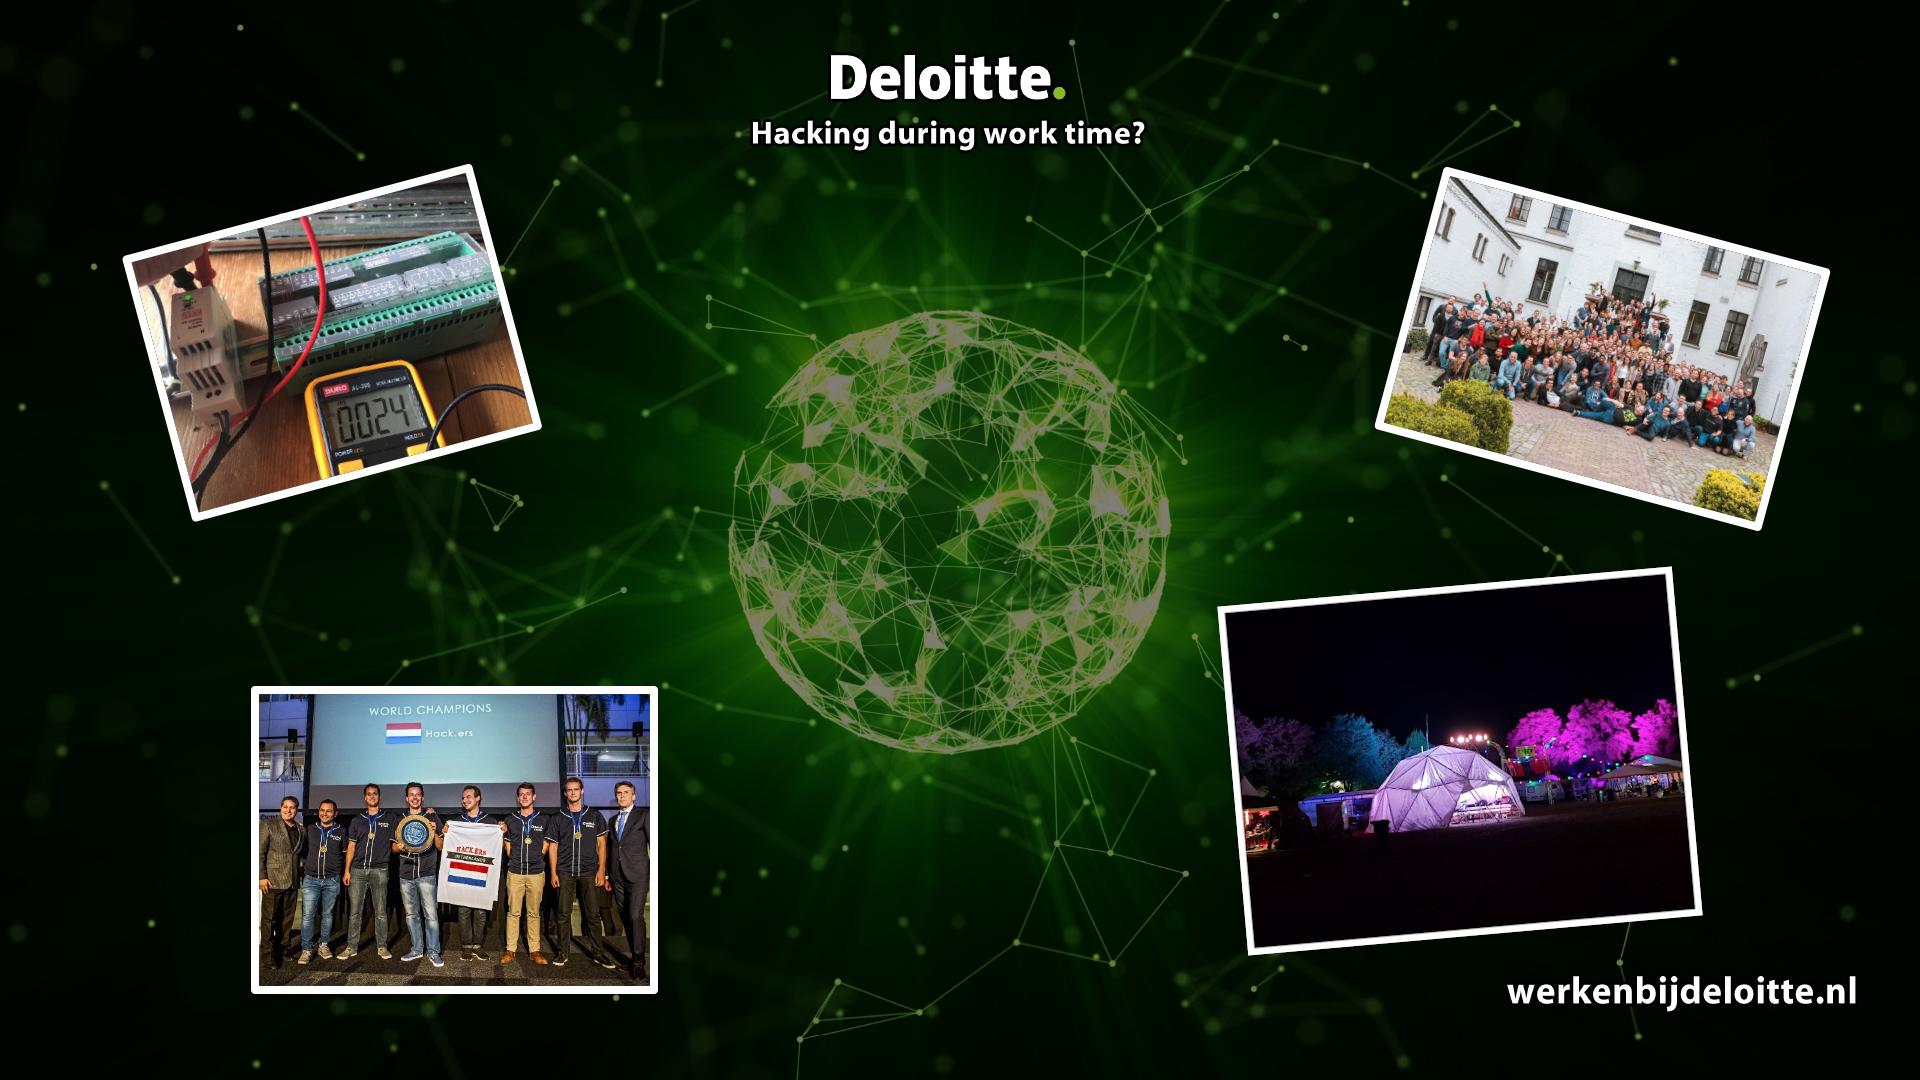 12.00 - Deloitte Presentation